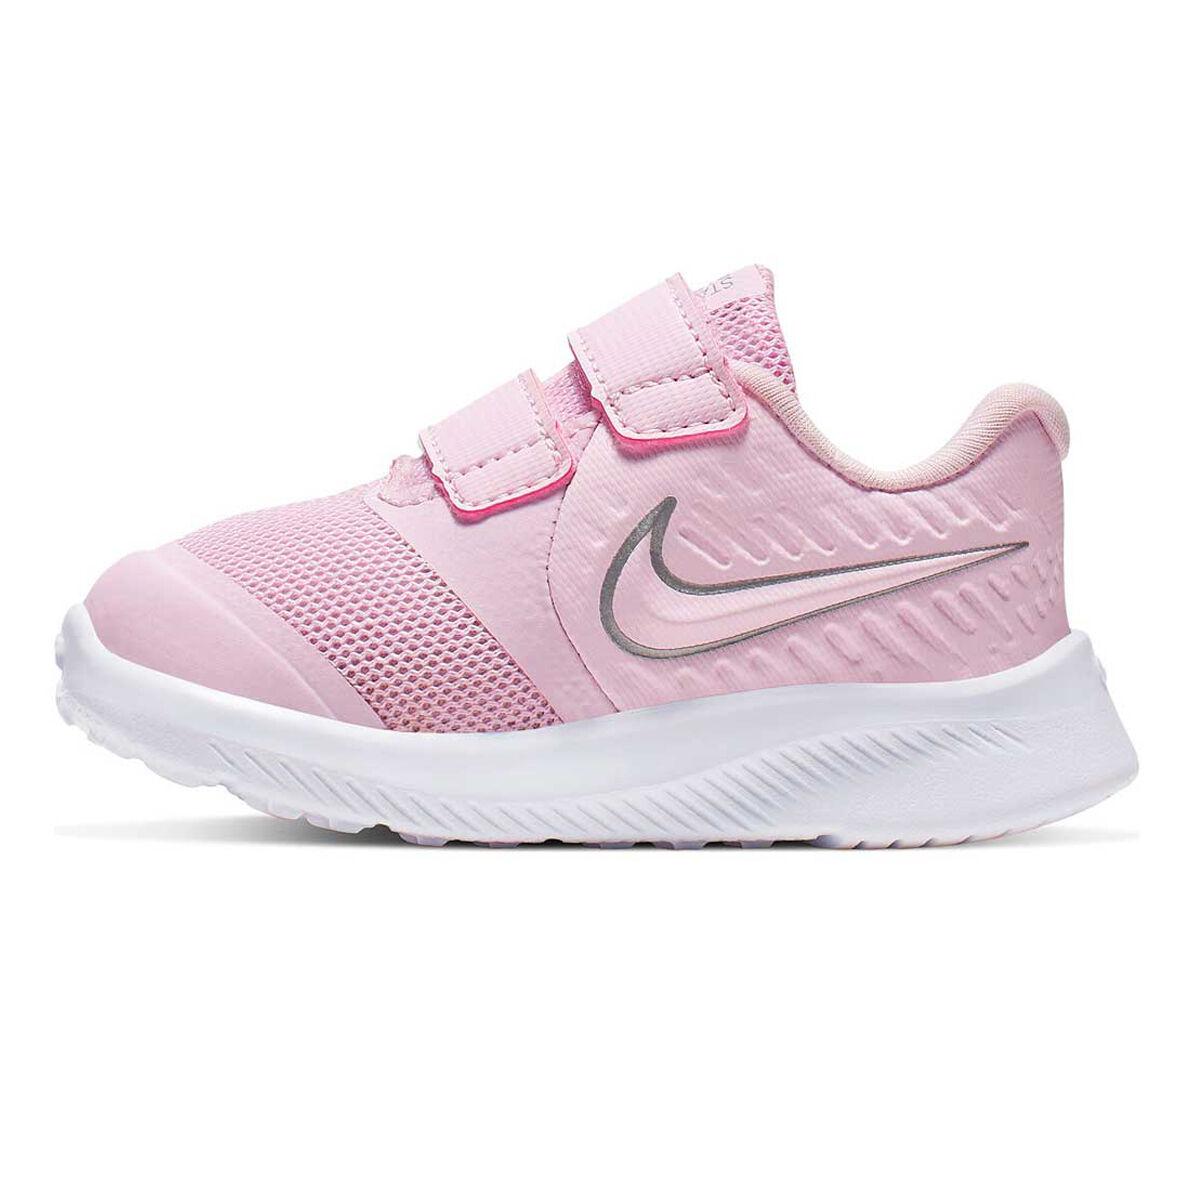 Toddler Girl Purple Nike Flex Sneaker Size 7